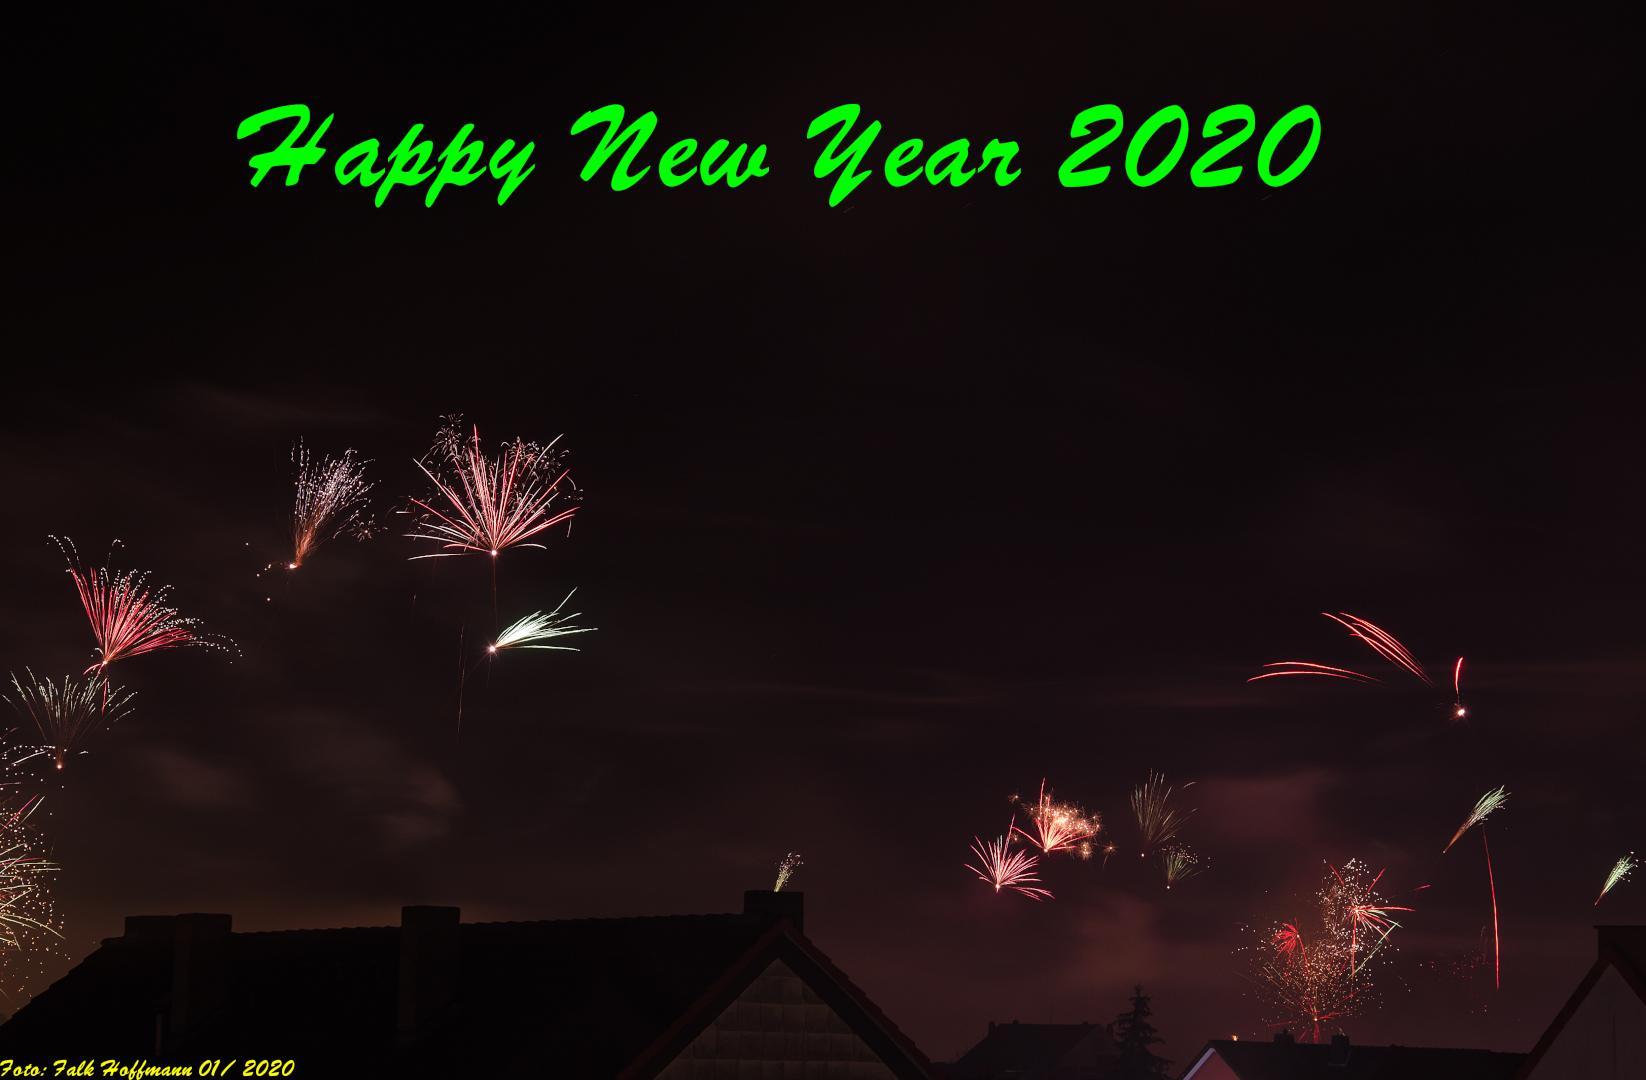 Neujahrsgruß